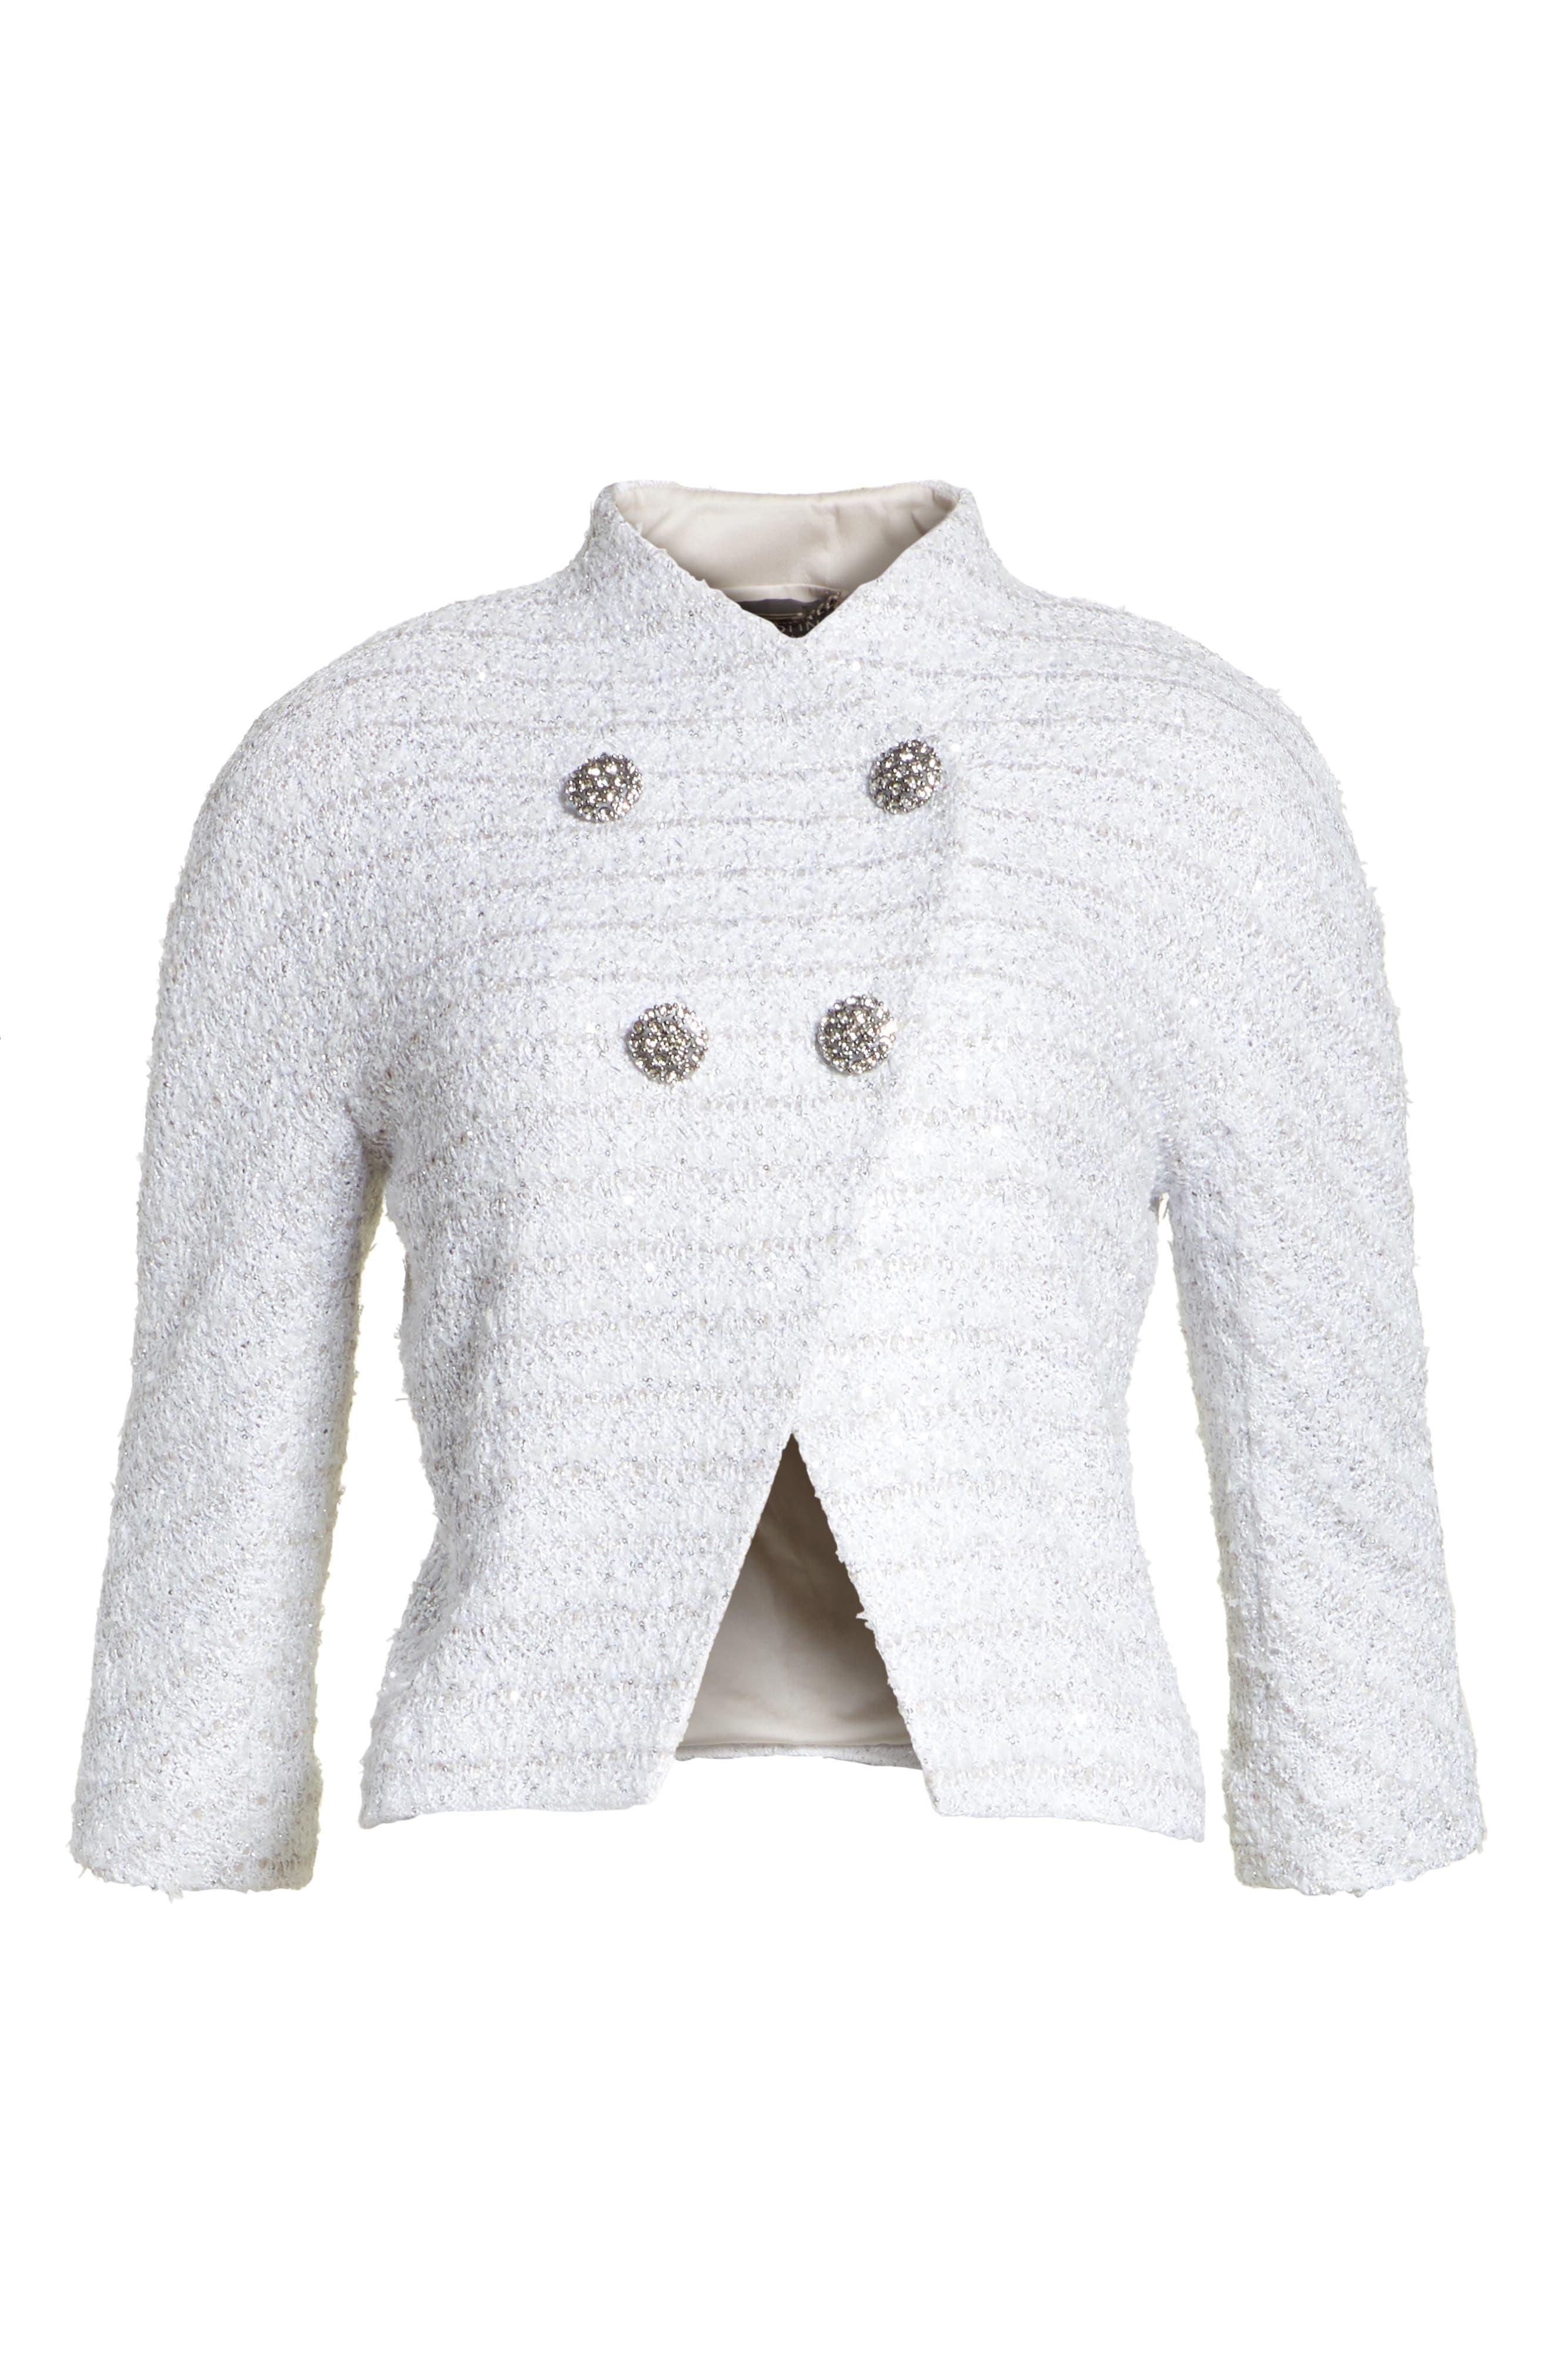 Frosted Metallic Tweed Jacket,                             Alternate thumbnail 7, color,                             Bianco Multi